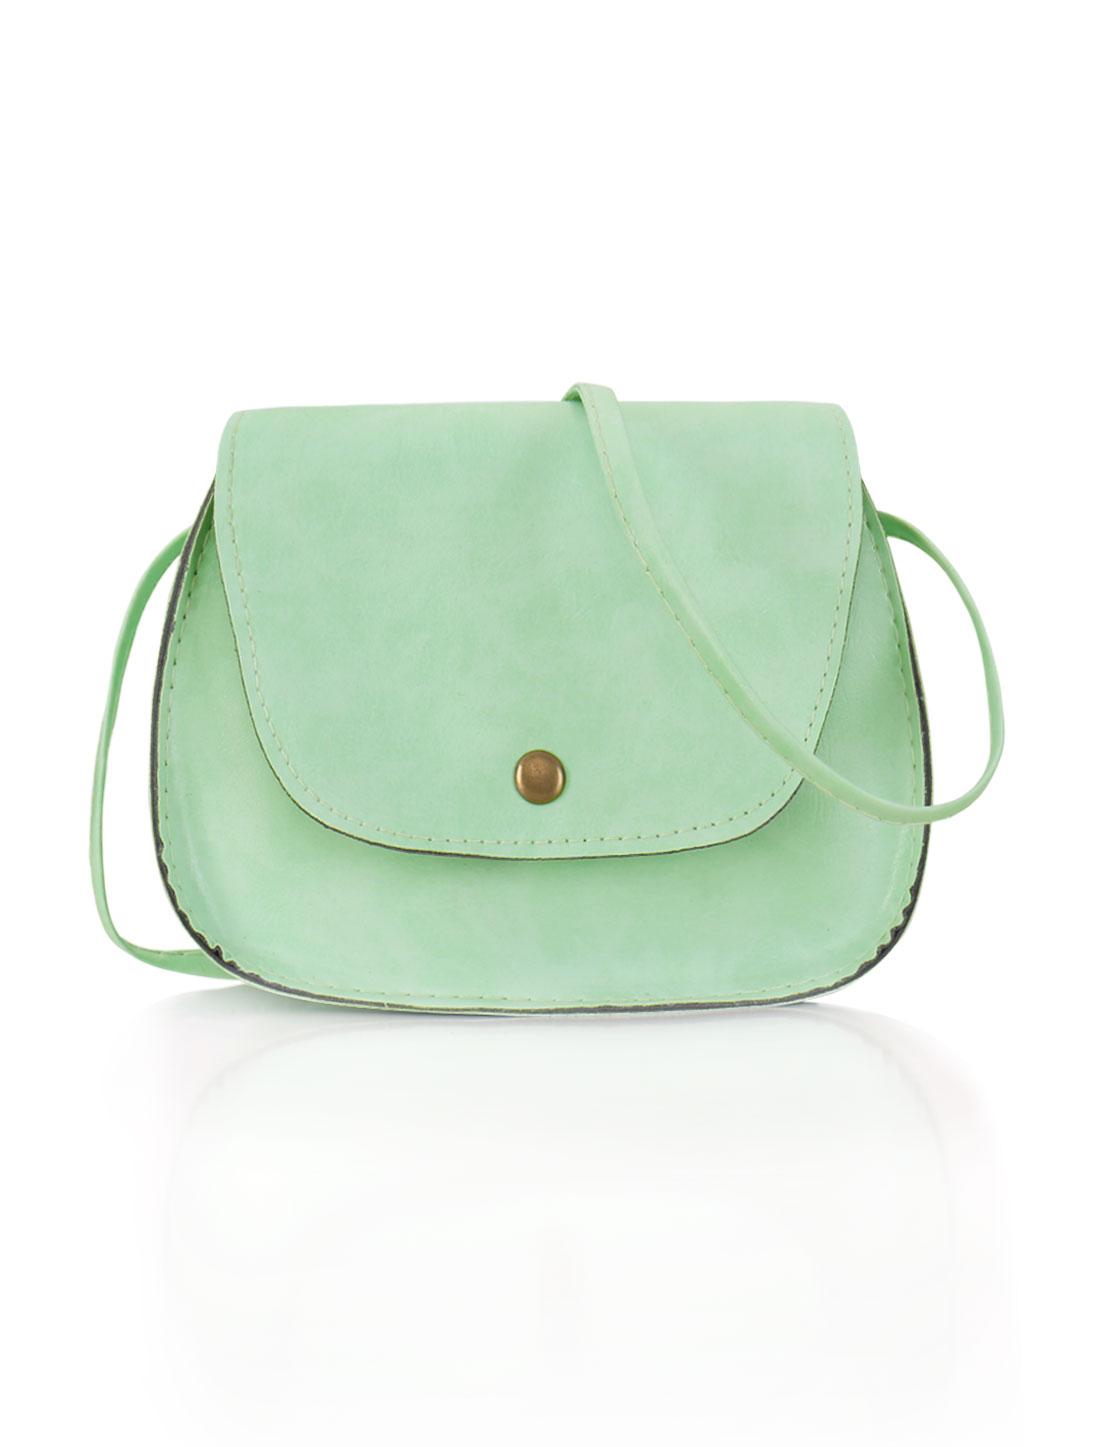 Women Detachable Strap Snap-Magnetic Closure Crossbody Bag Green